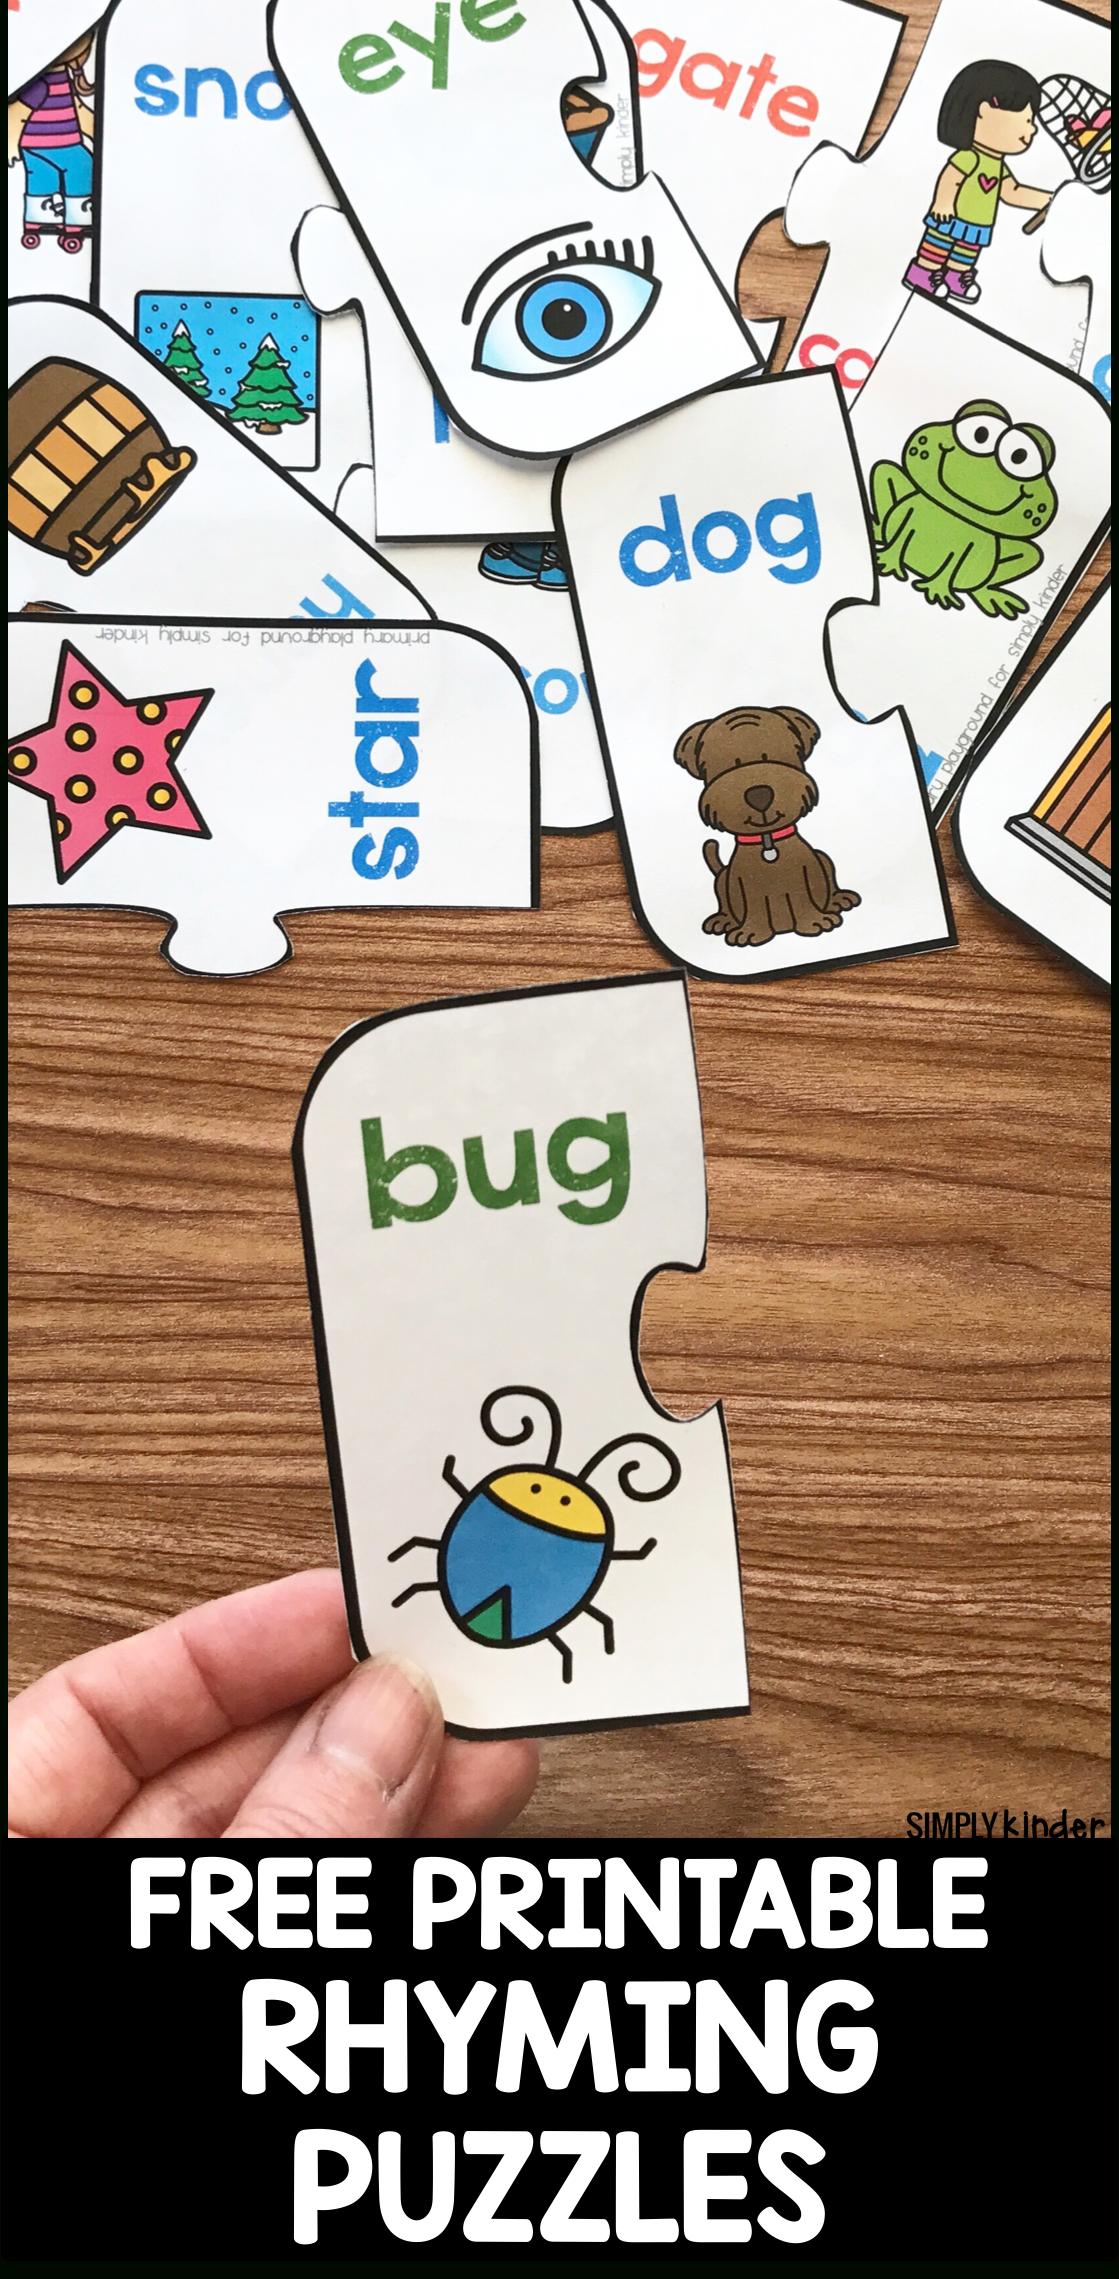 Free Printable Rhyming Puzzles - Simply Kinder - Printable Floor Puzzle